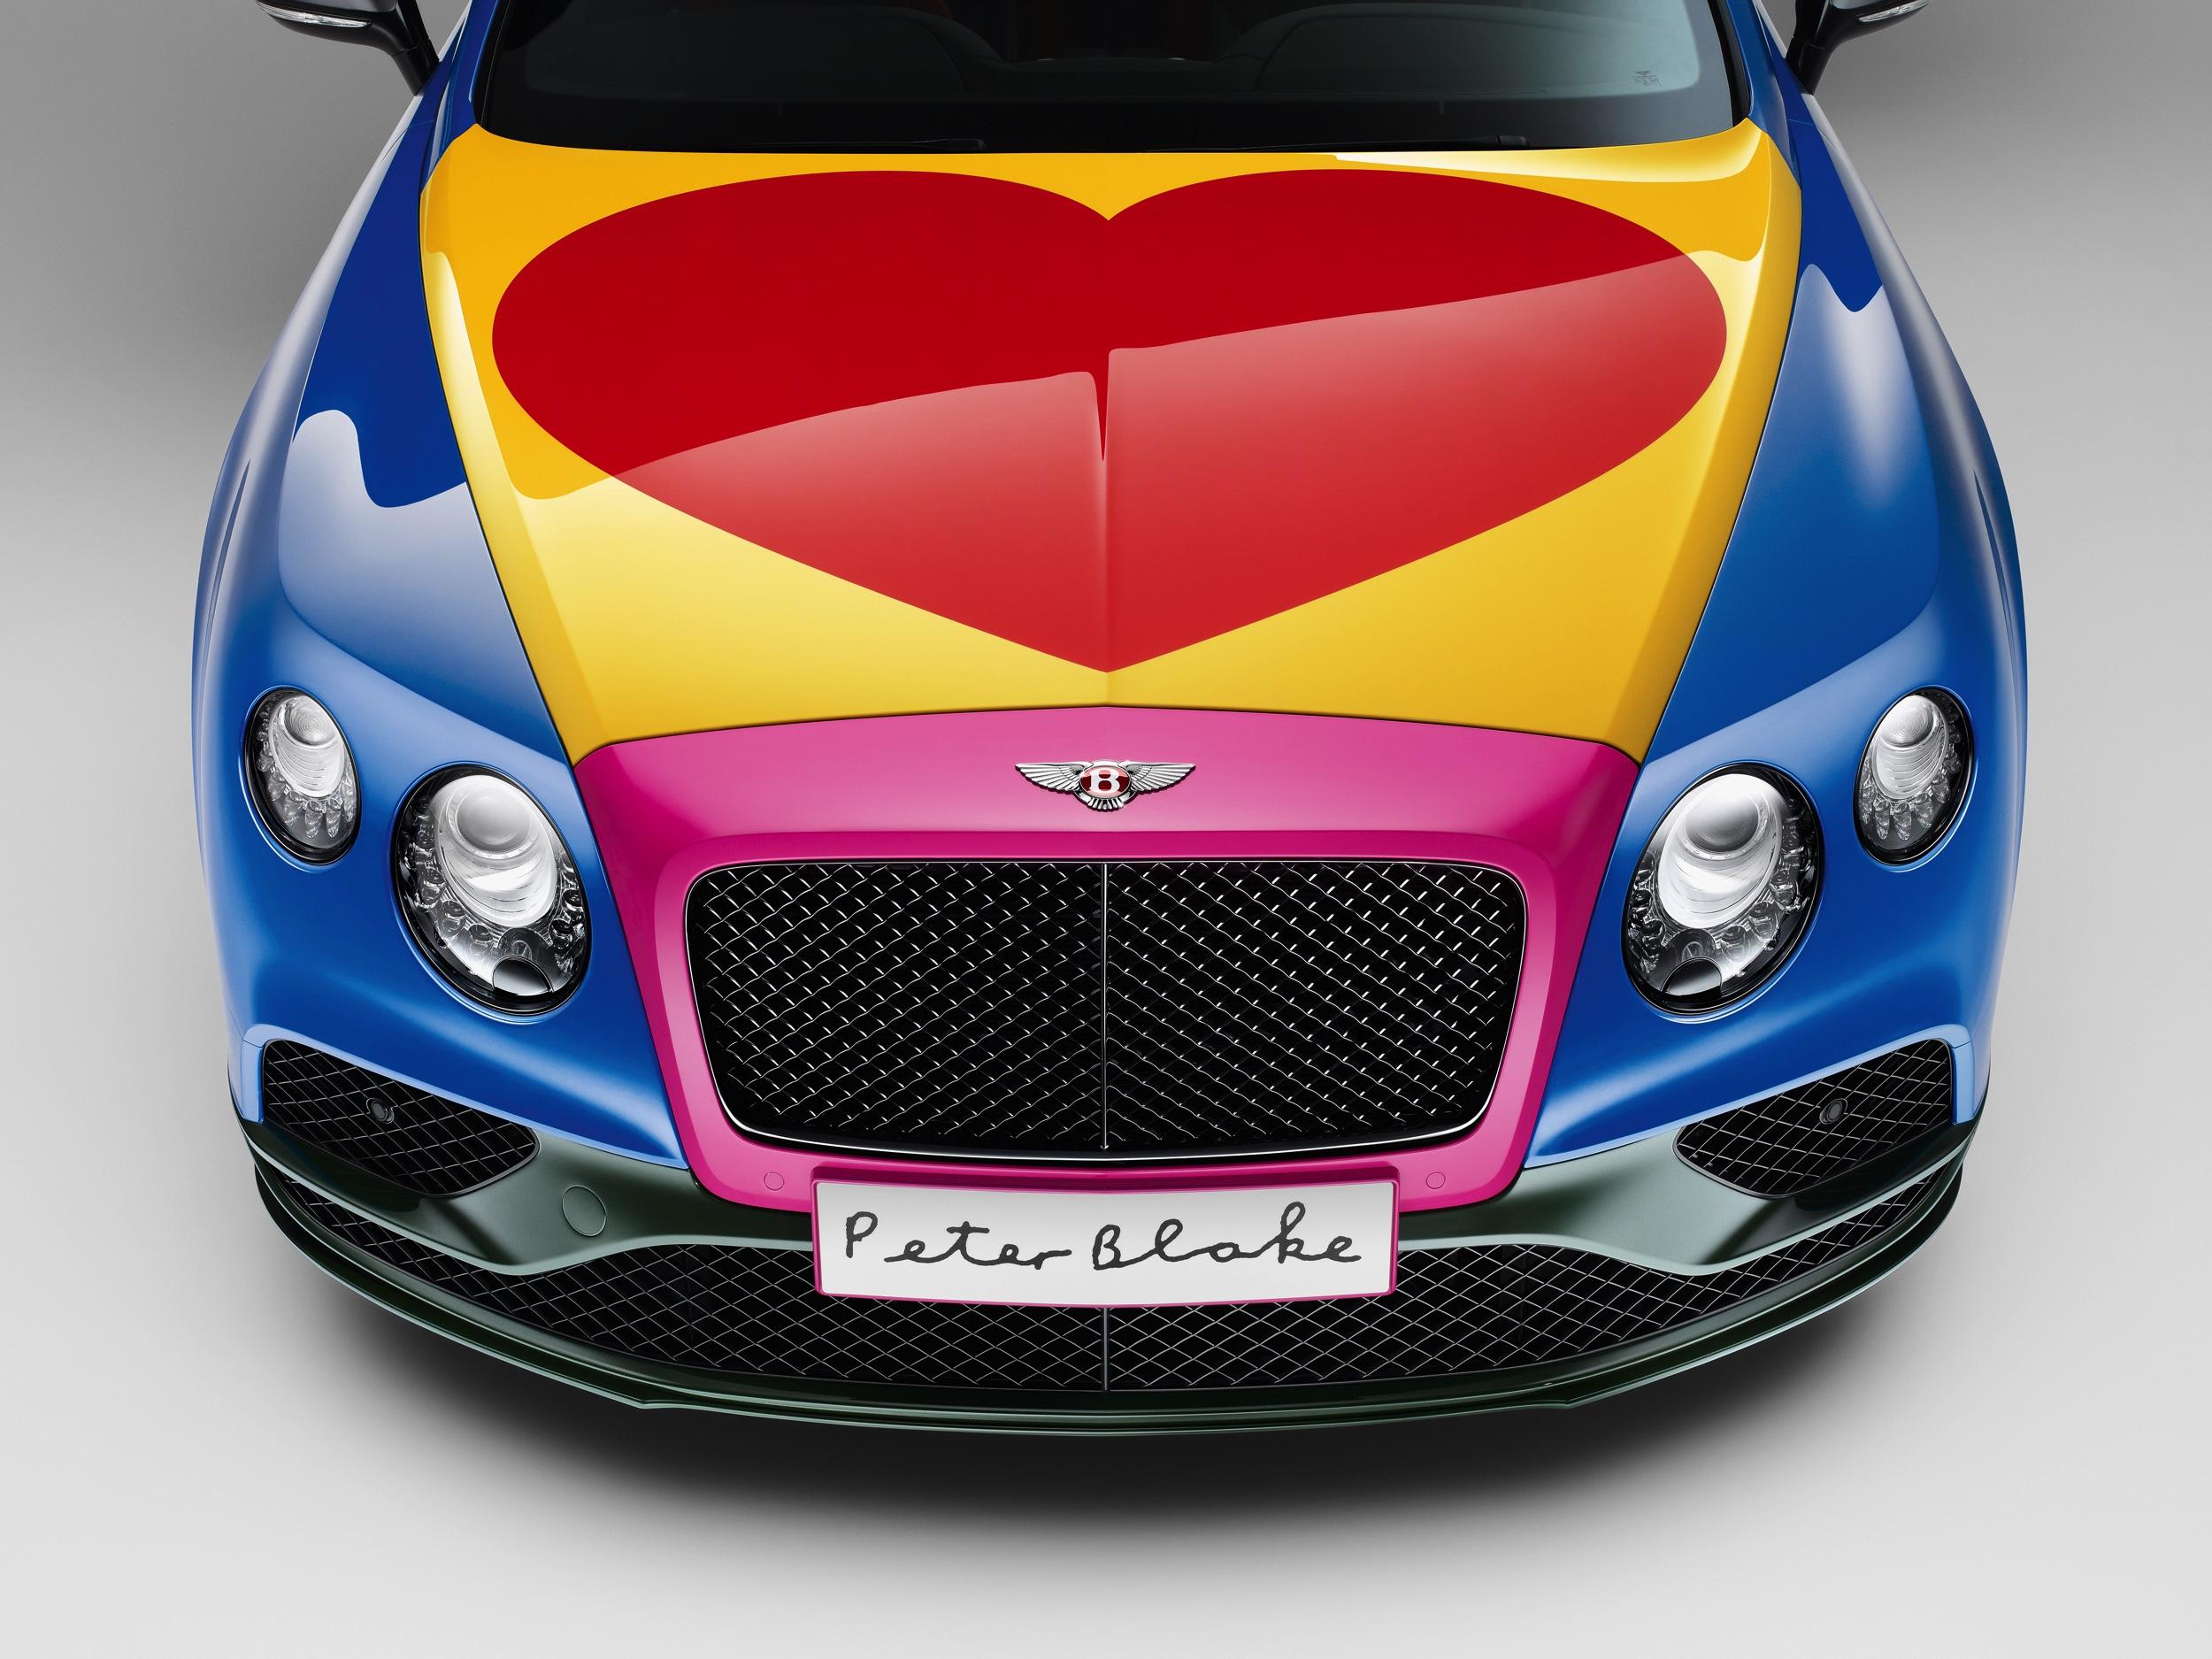 Bentley Continental by Peter Blake -3- Autovisie.nl